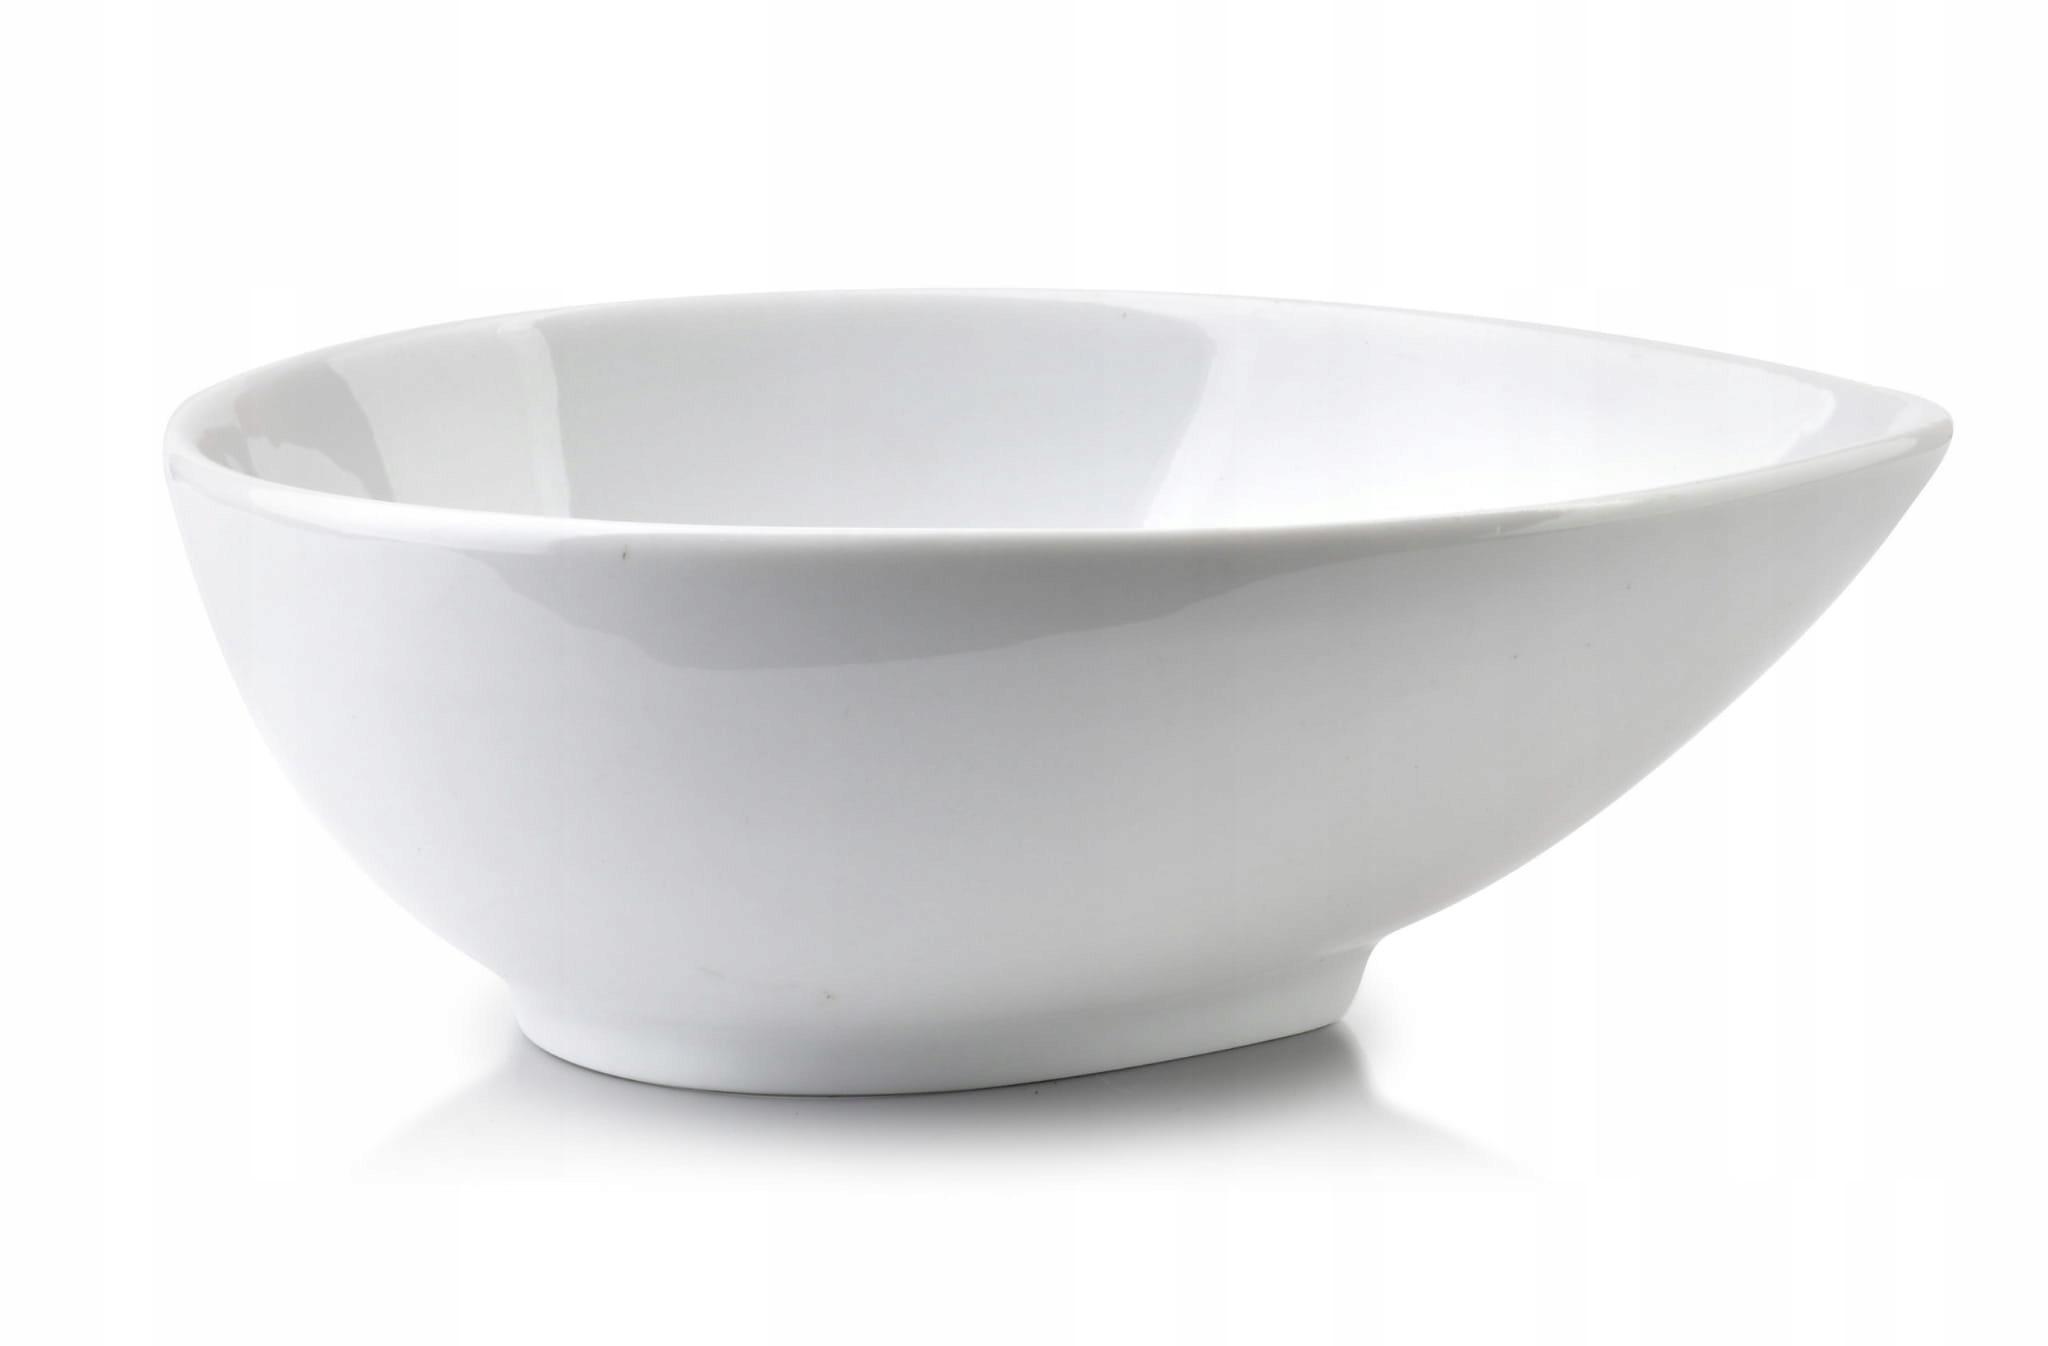 Чаша / миска фарфоровая Kropla 11см x 15см